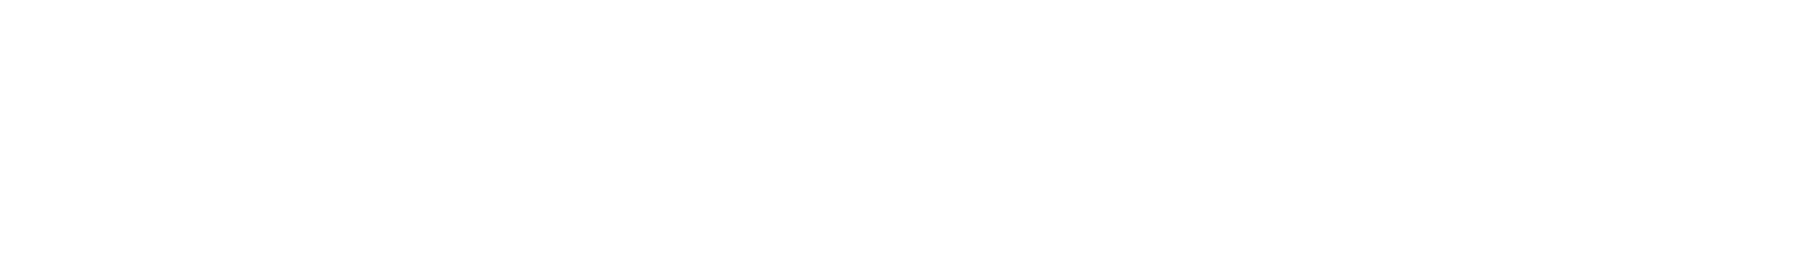 perc 1 28